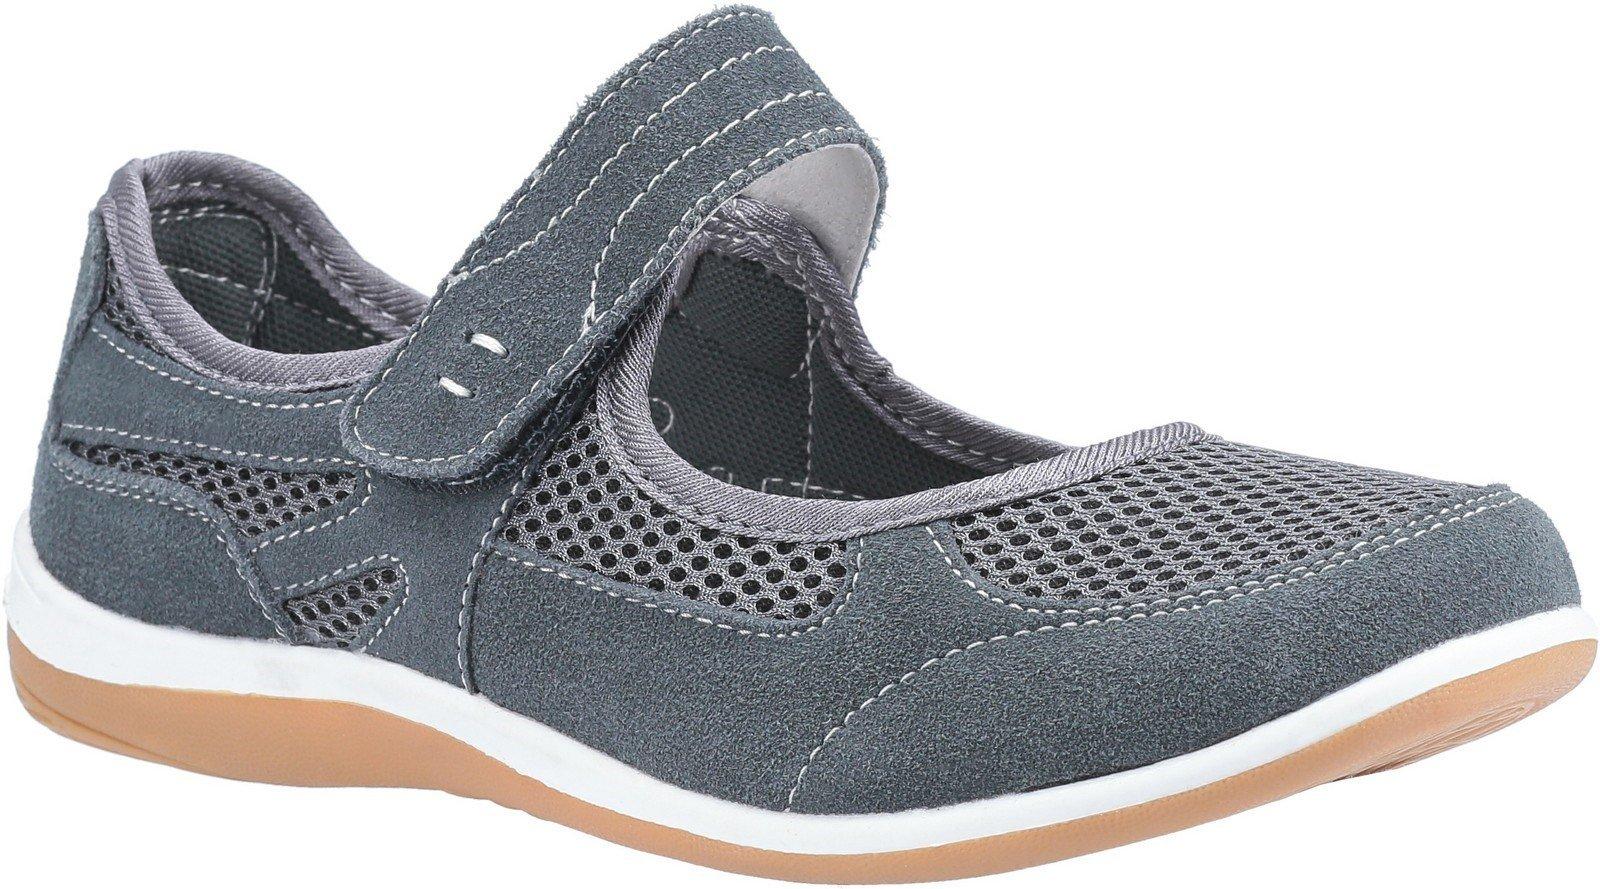 Fleet & Foster Women's Morgan Touch Slip on Sandal Various Colours 30110-51113 - Grey 3